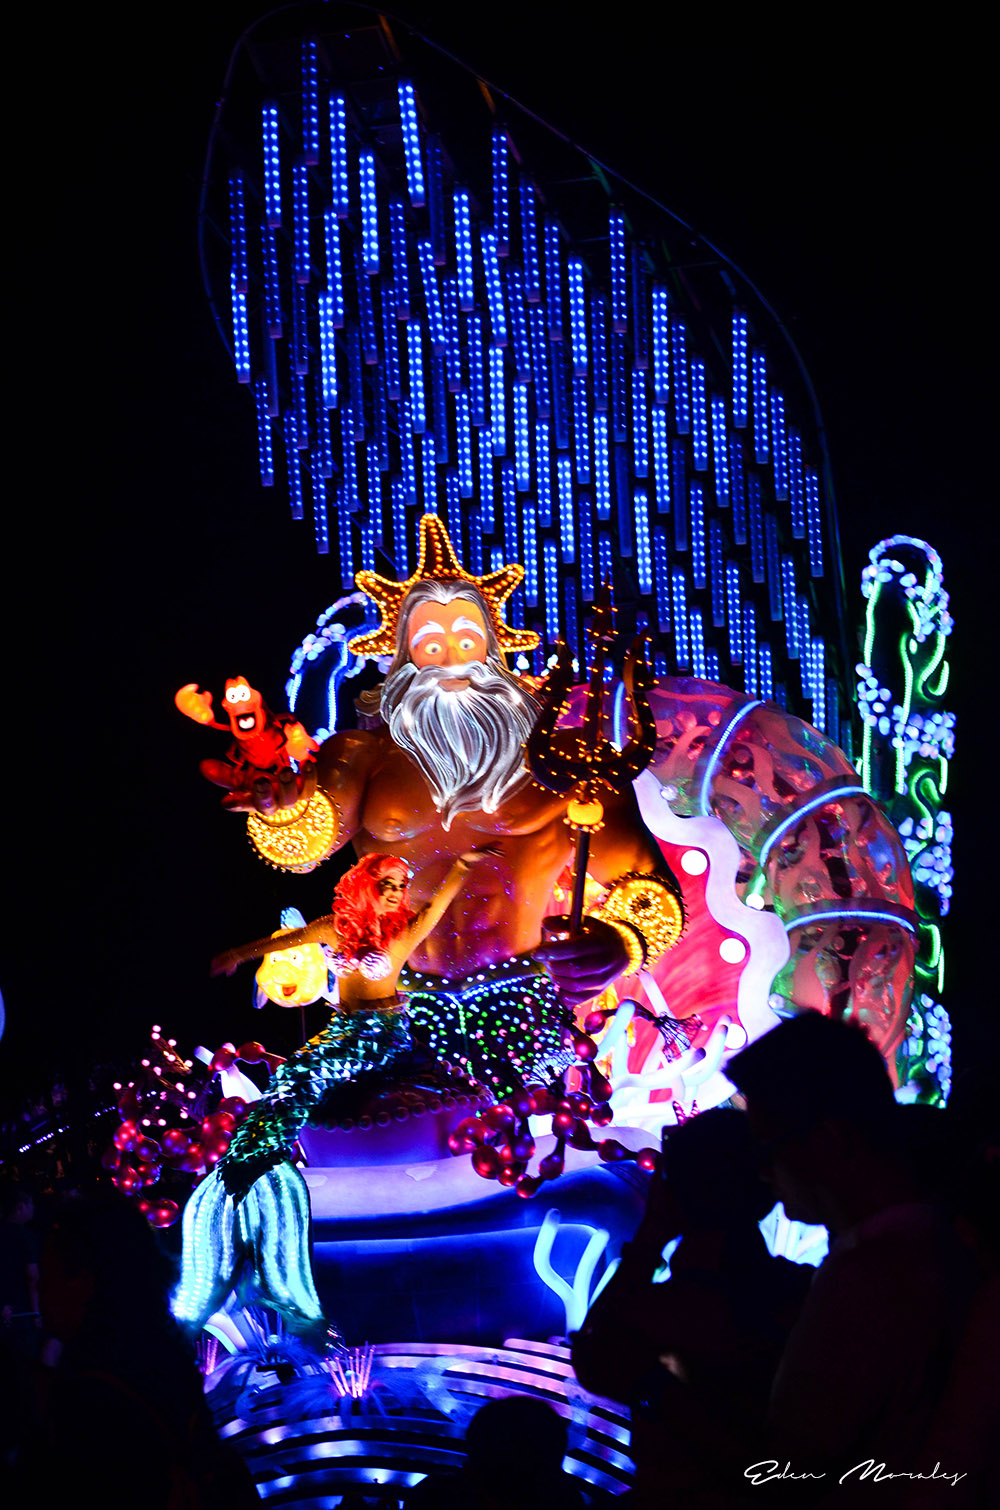 Uncovering-Eden-Hong Kong-Disneyland-12